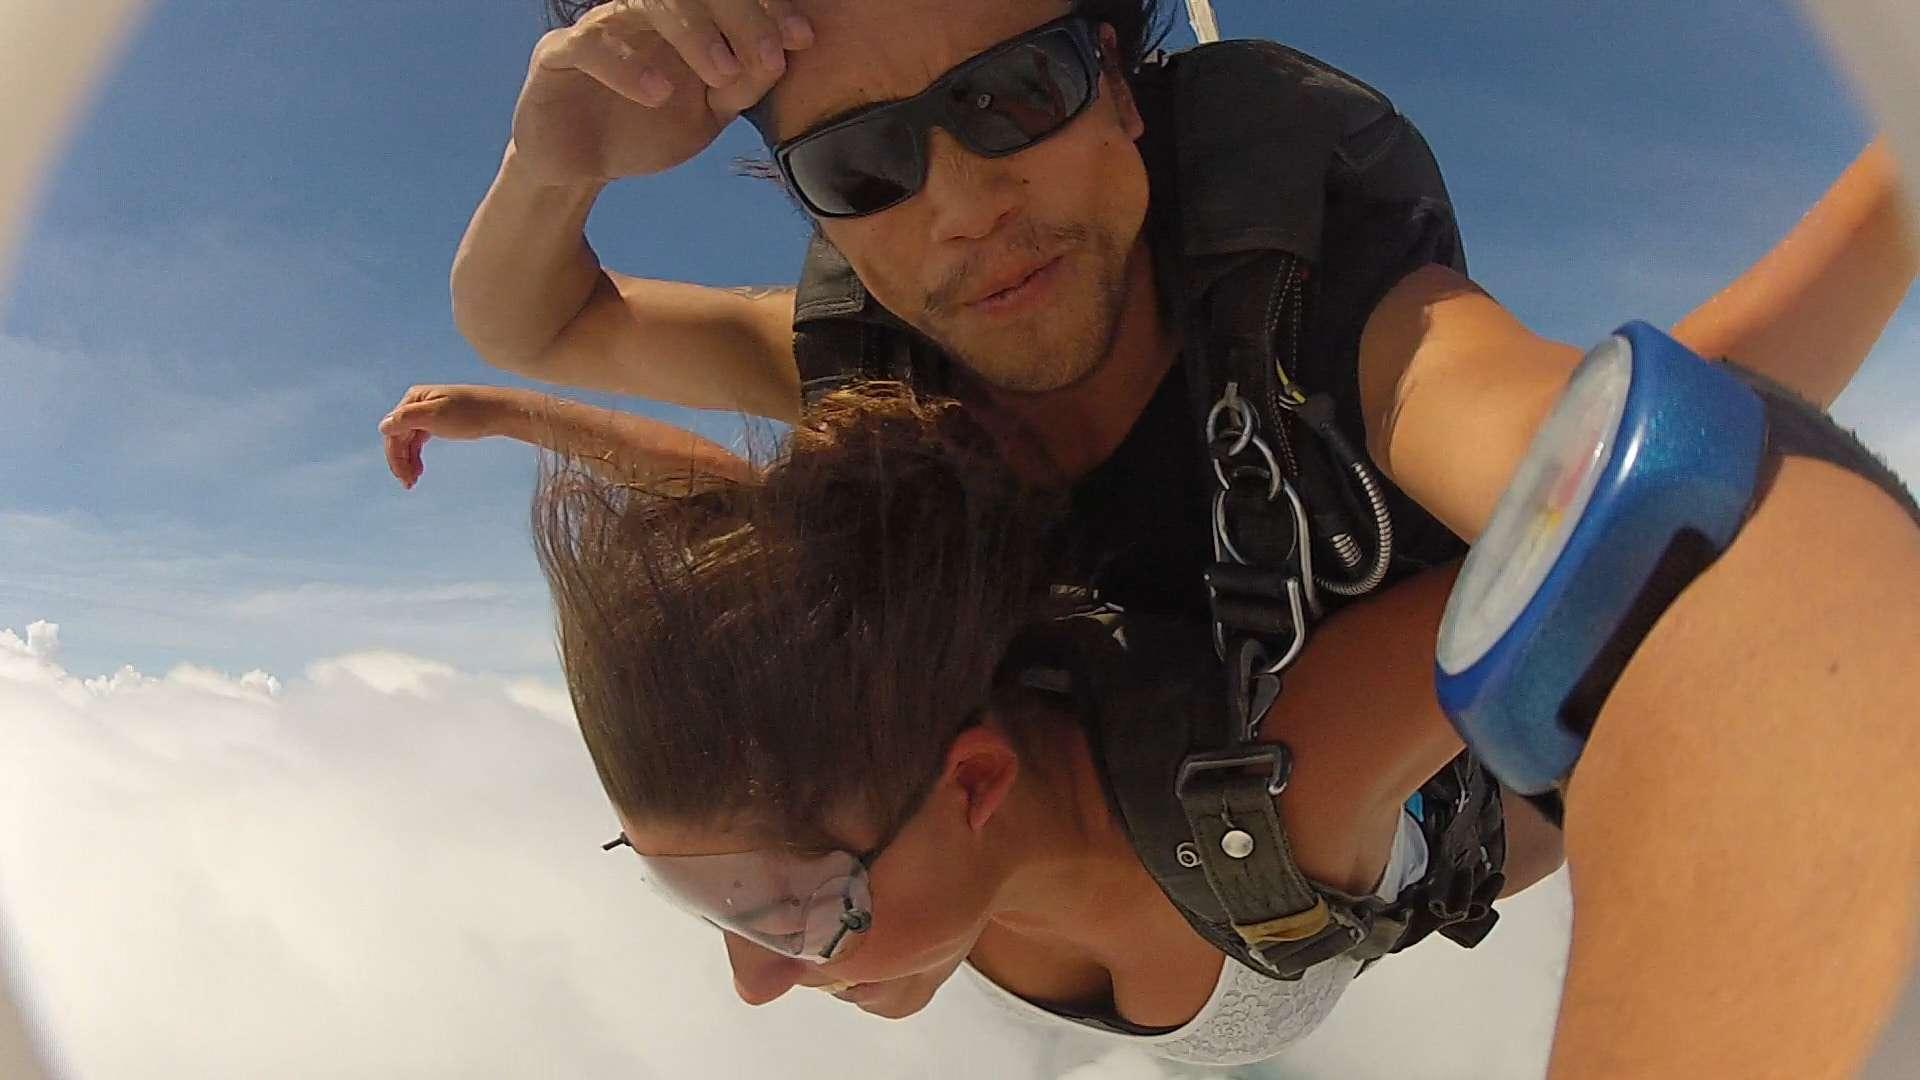 backpacken in australie, skydiven